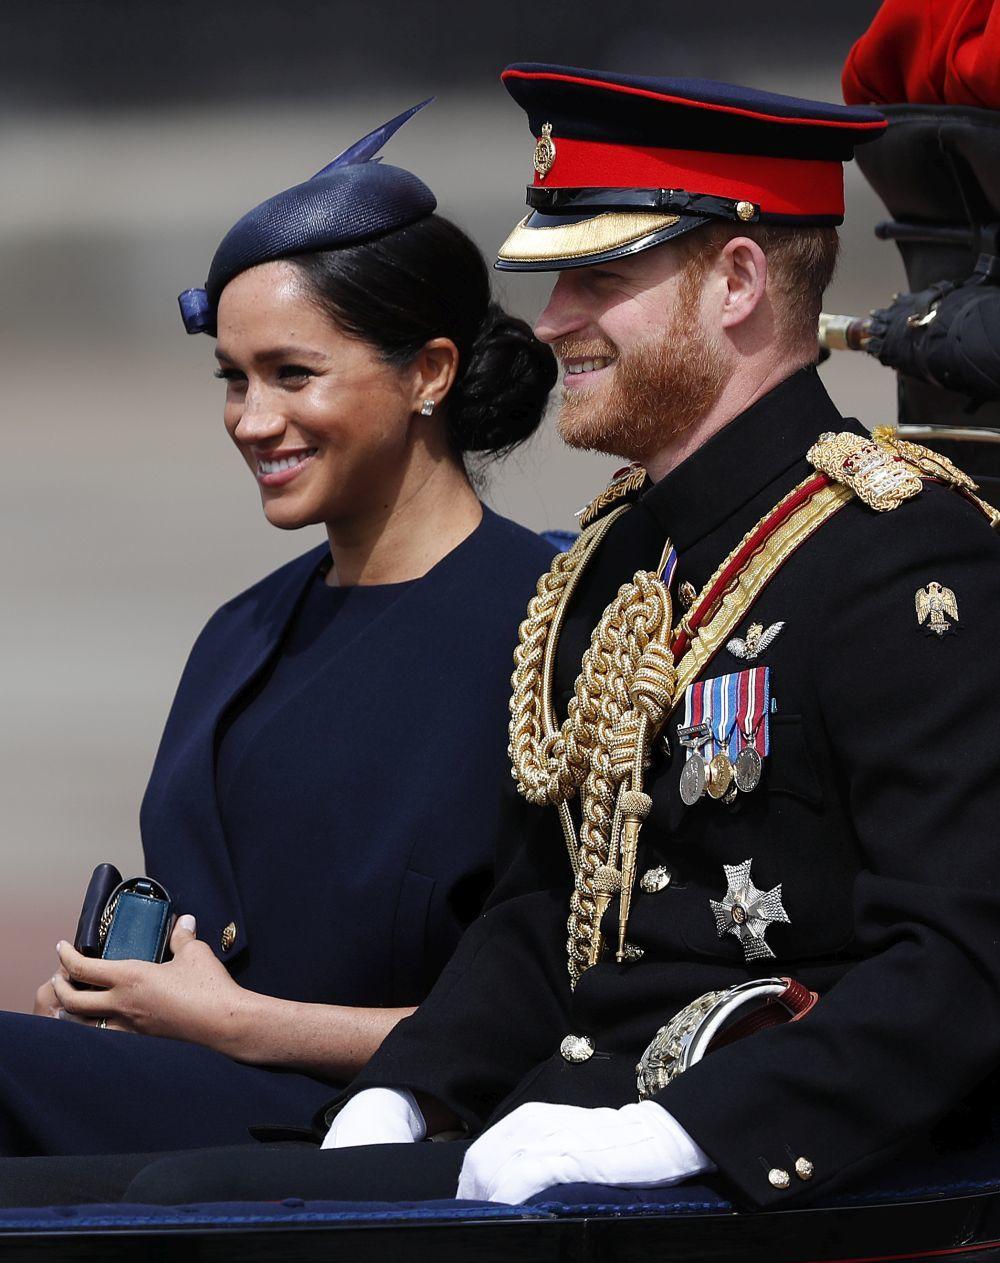 Los Duques de Sussex en el Trooping the Colour.